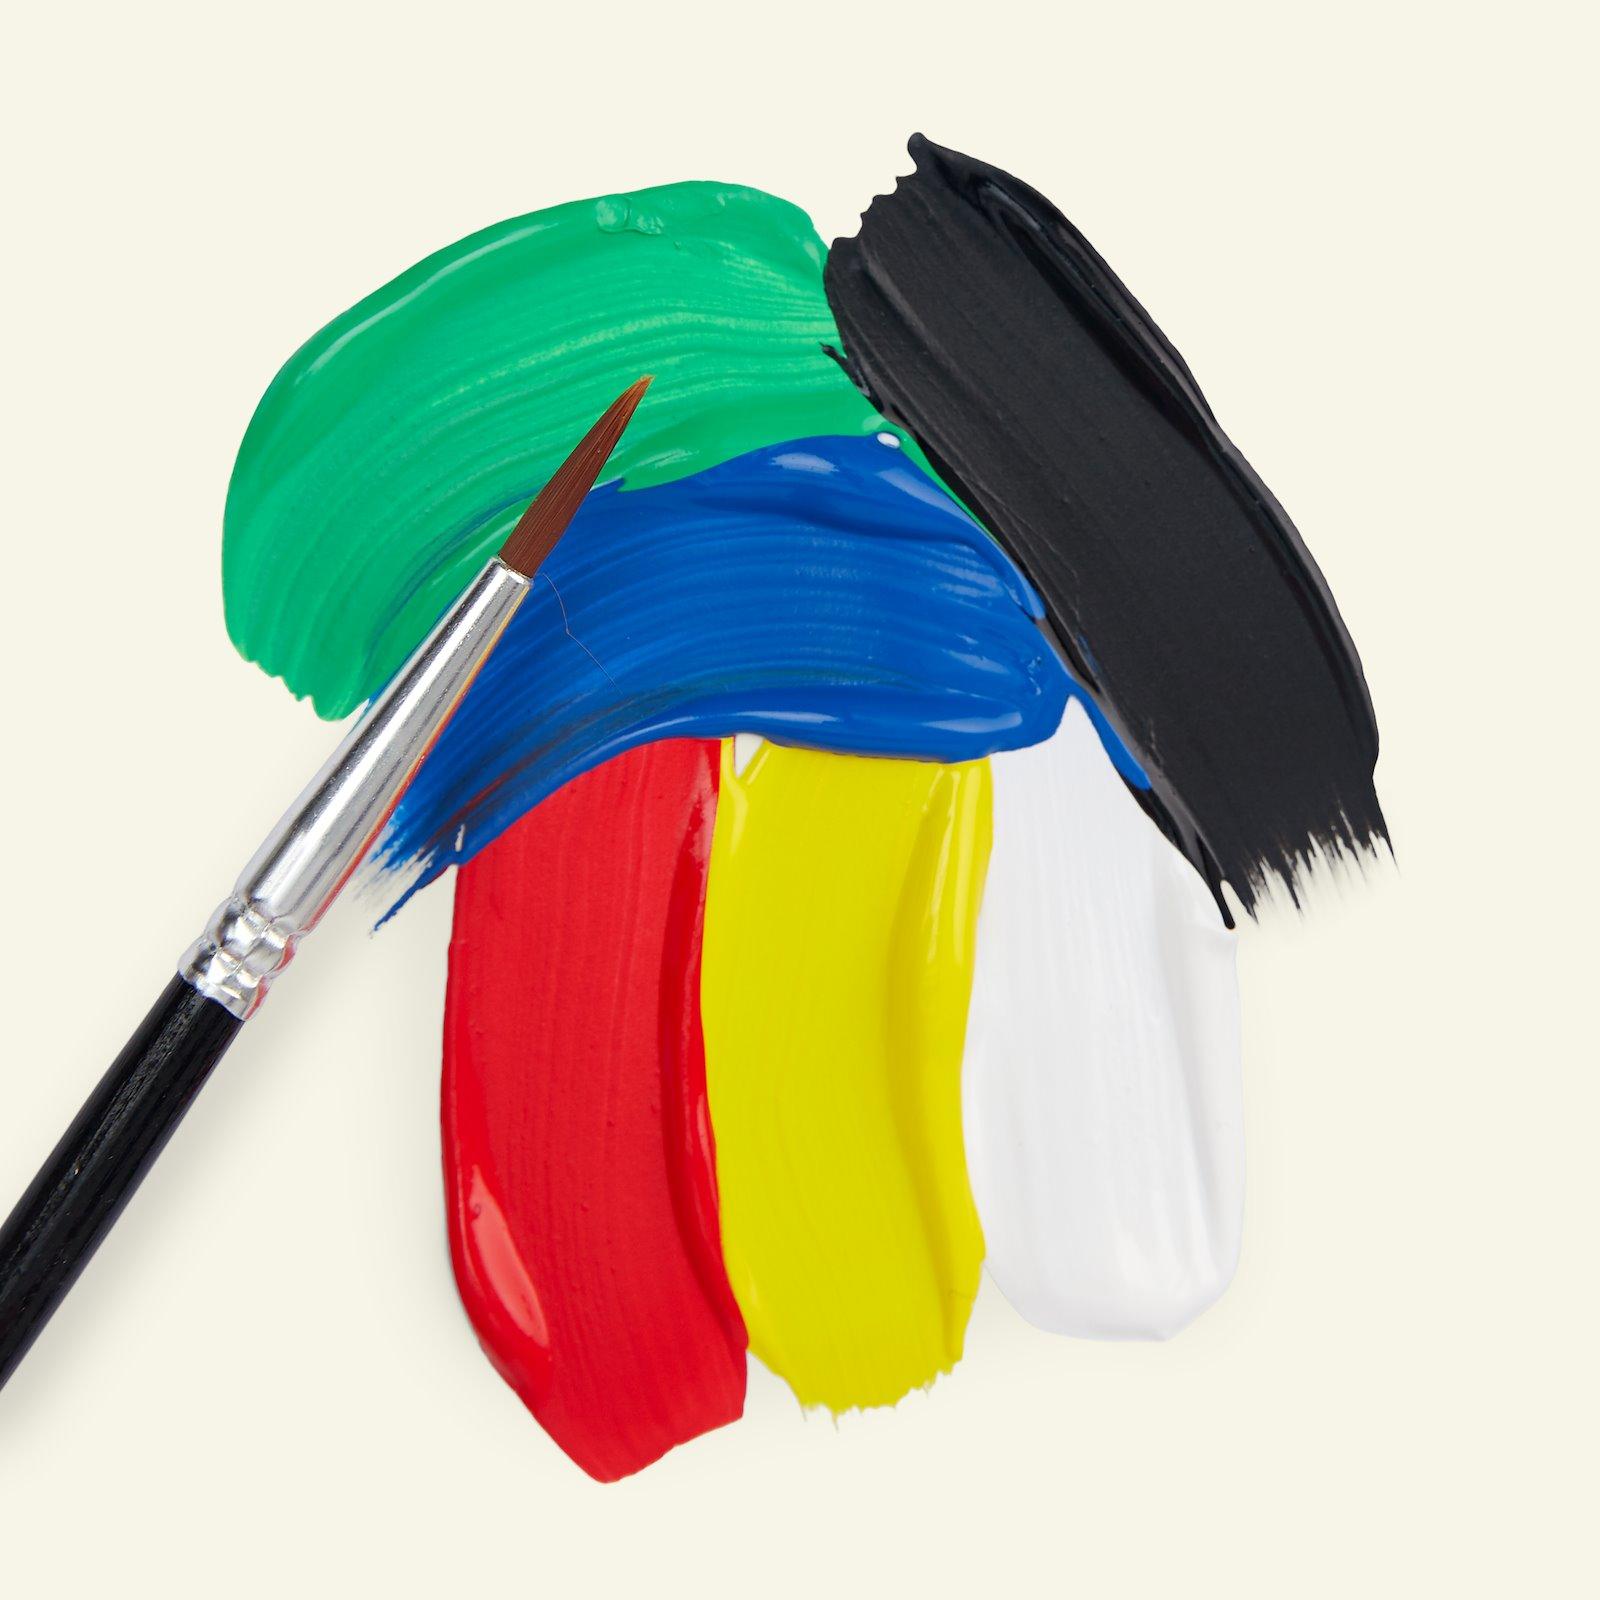 Javana opq fabric paints basic 6x20ml 29554_pack